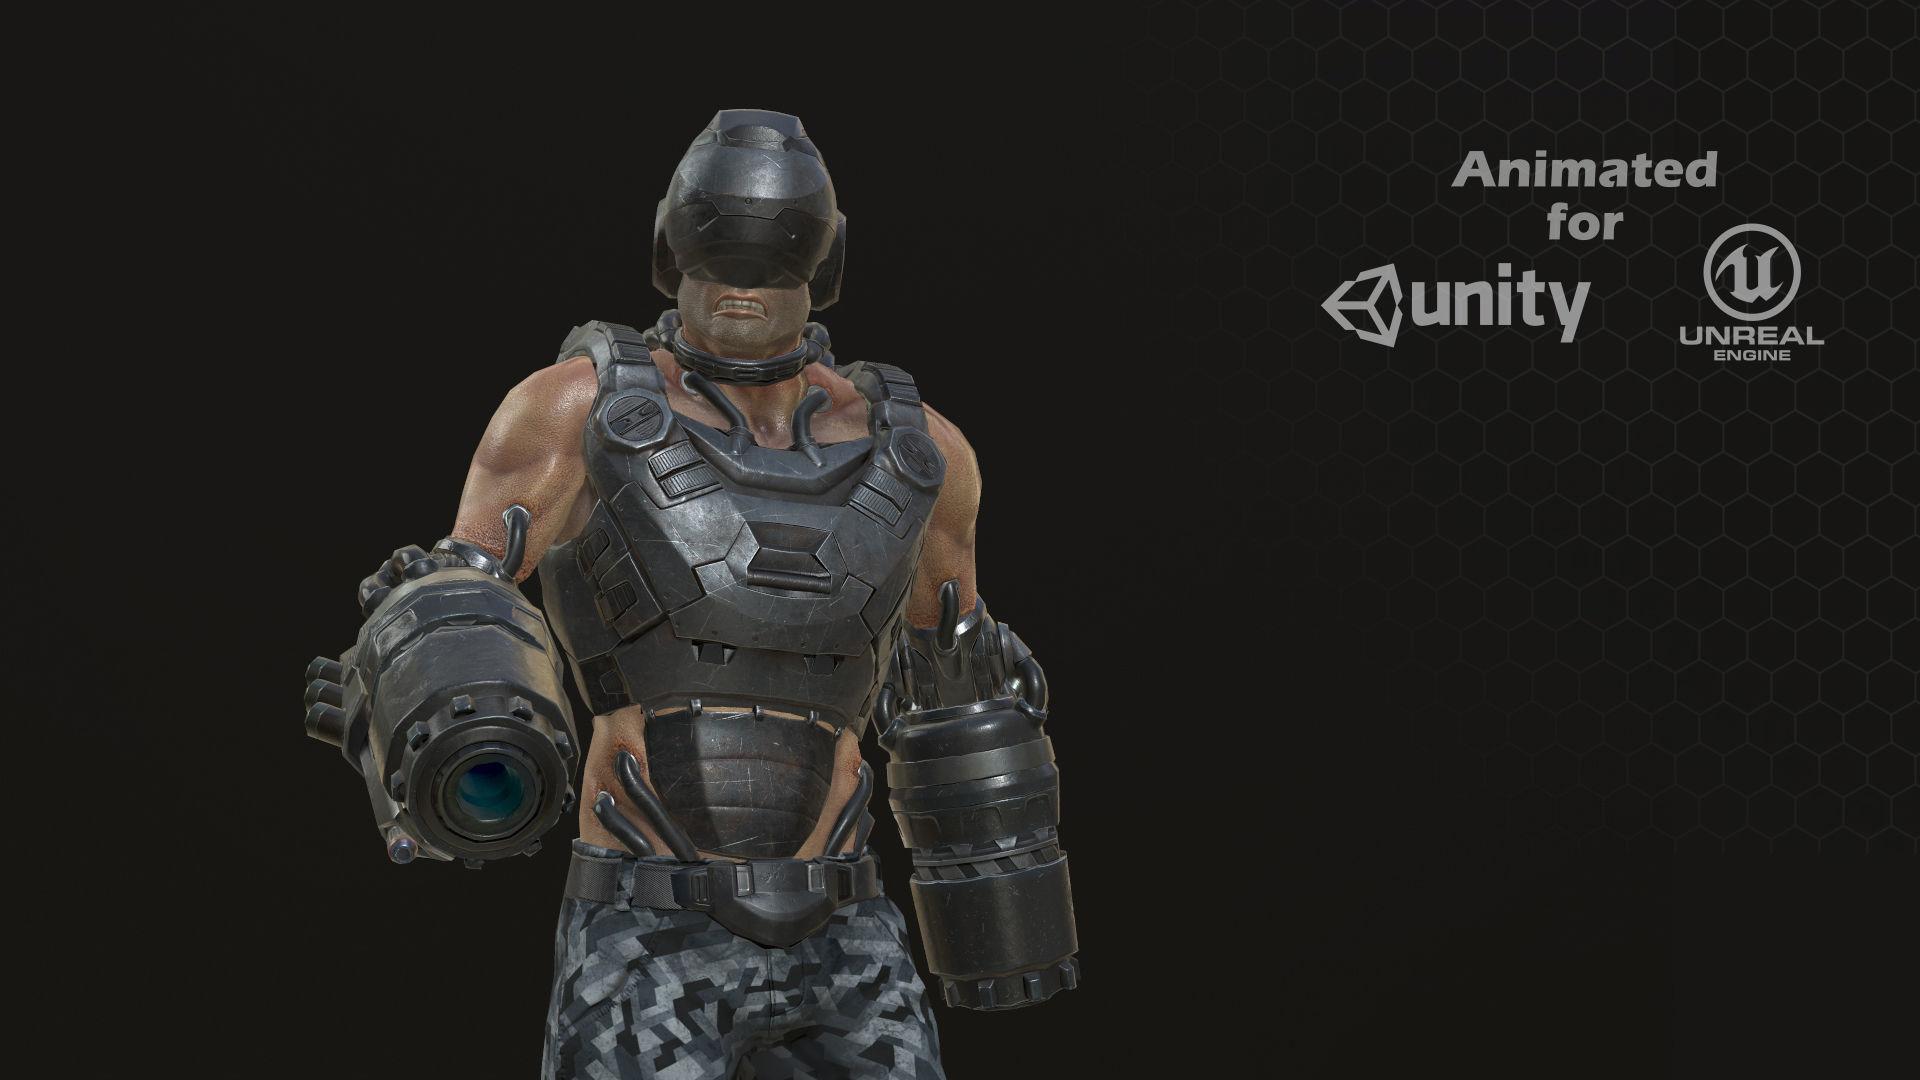 Sci Fi Soldier kamikaze